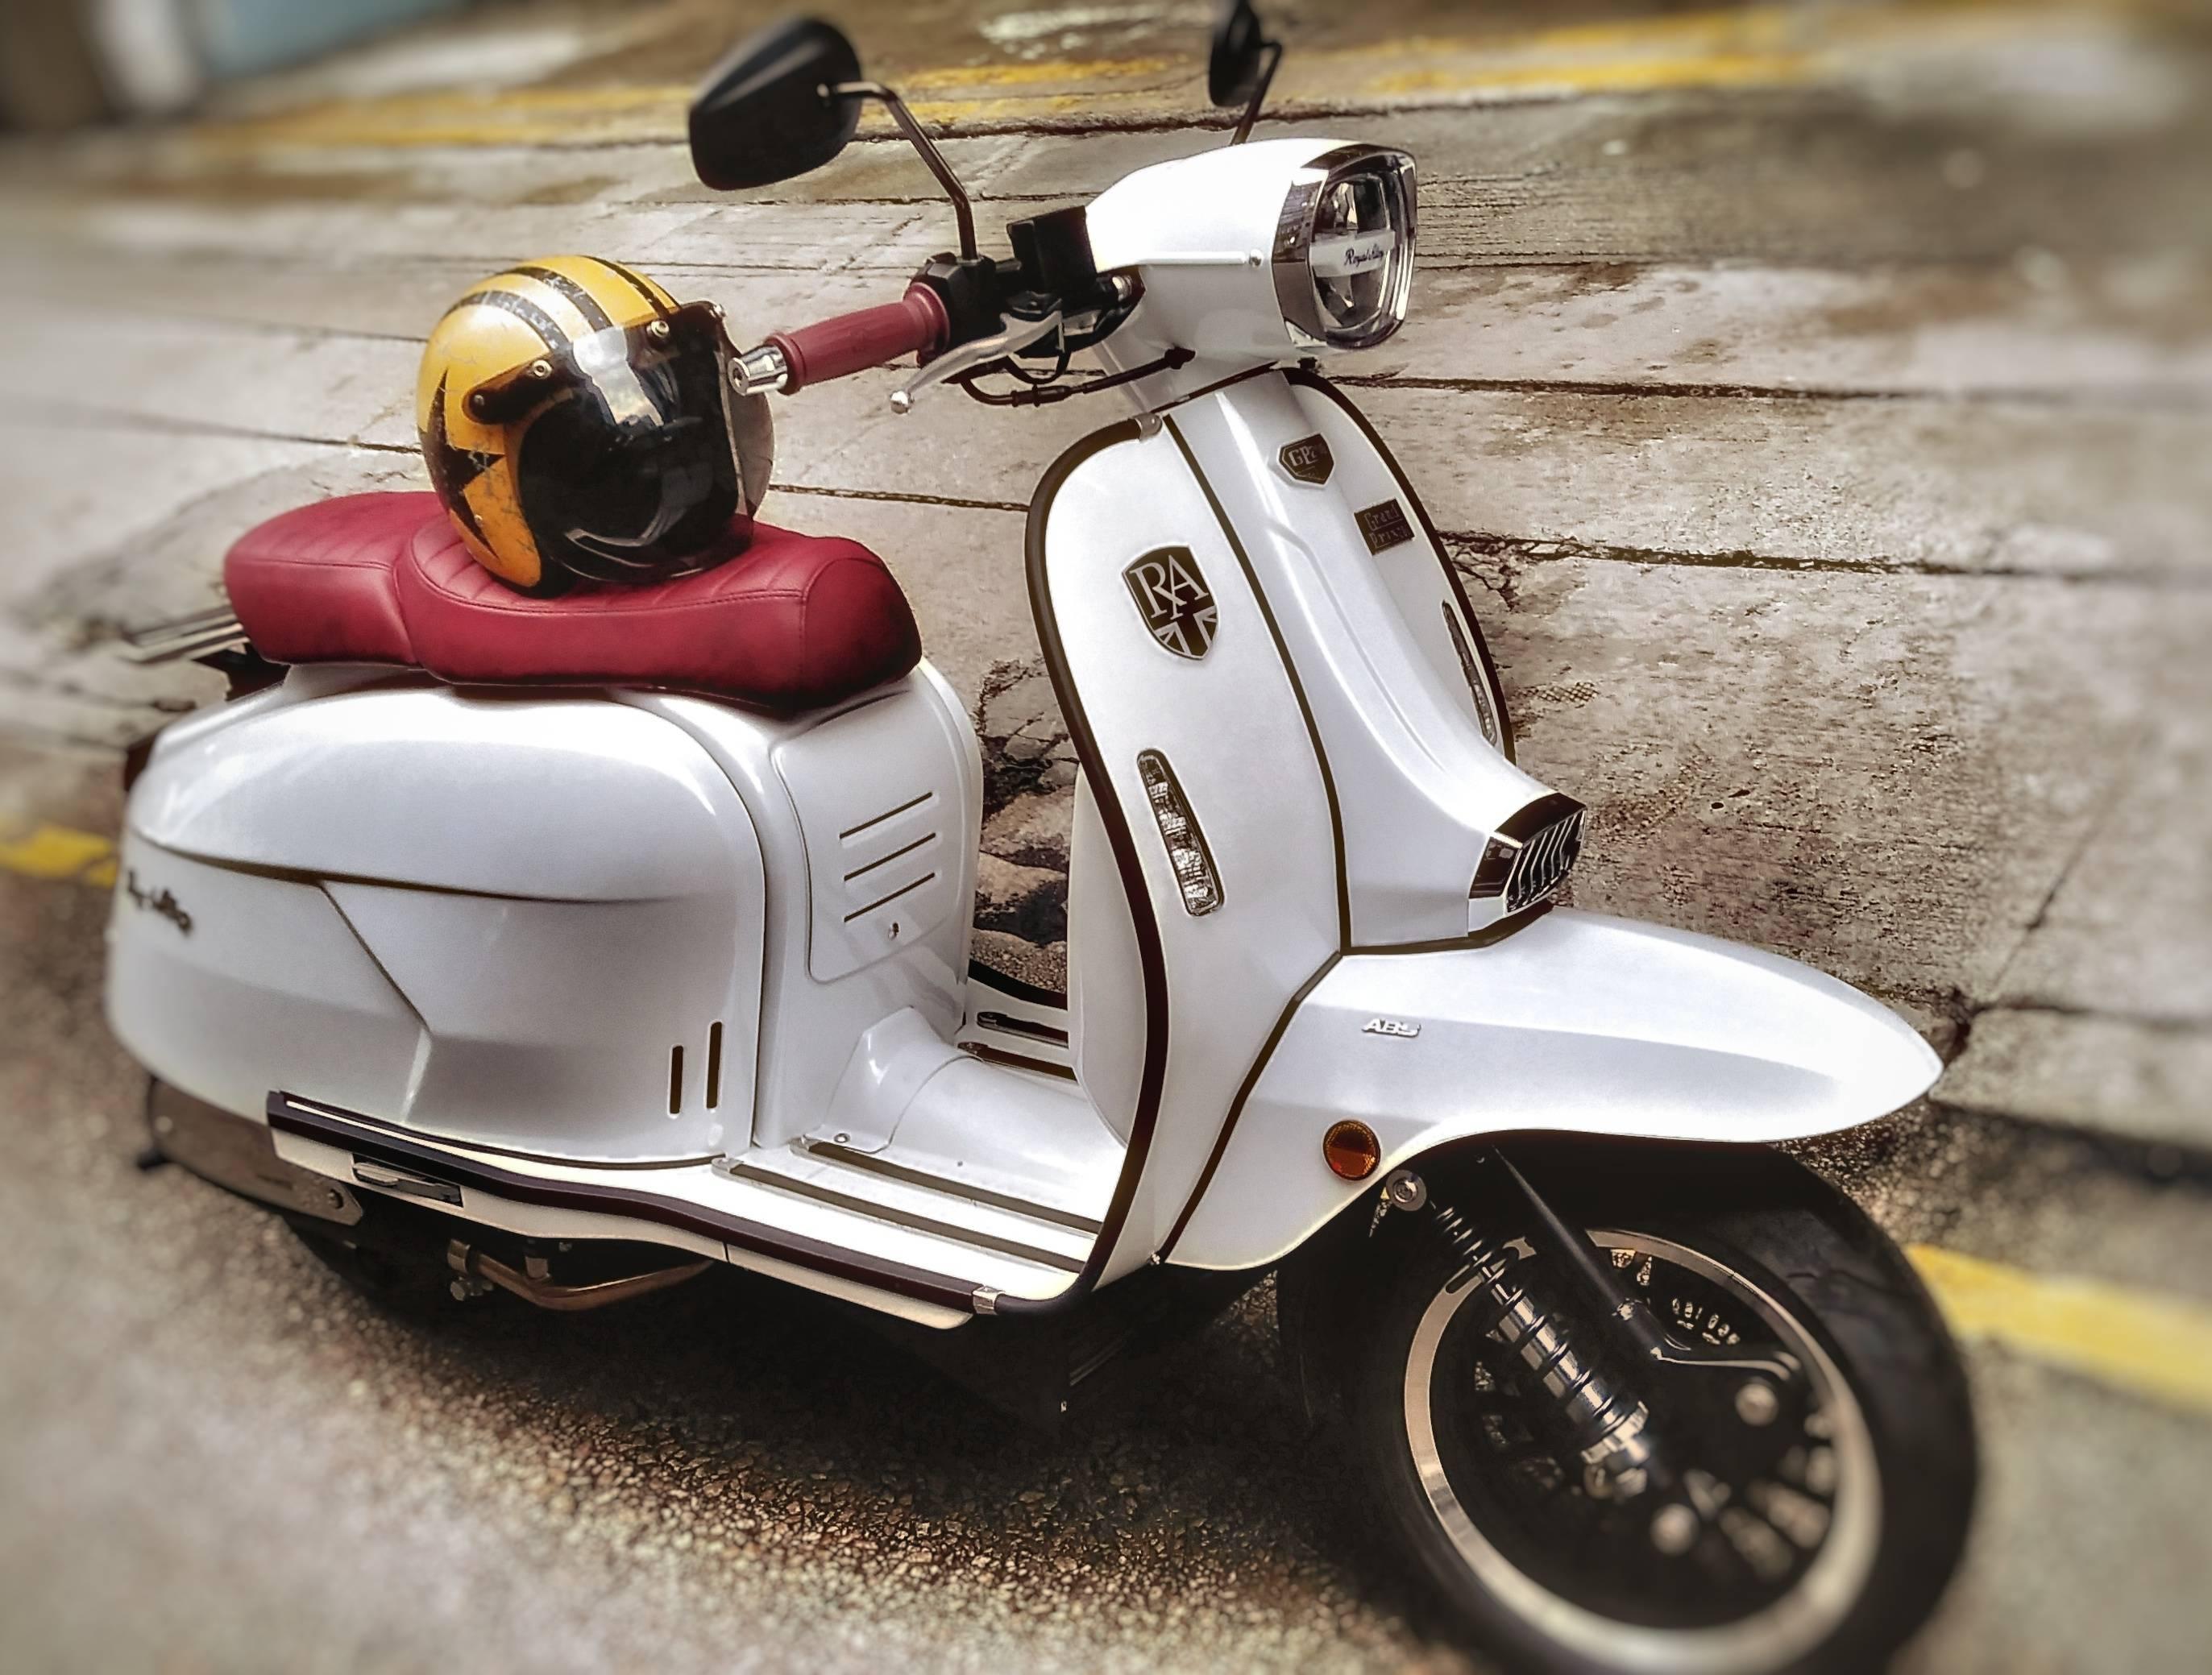 【個人自售】 ROYAL ENFIELD ROYAL ENFIELD 其他 二手車 2019年 - 「Webike摩托車市」